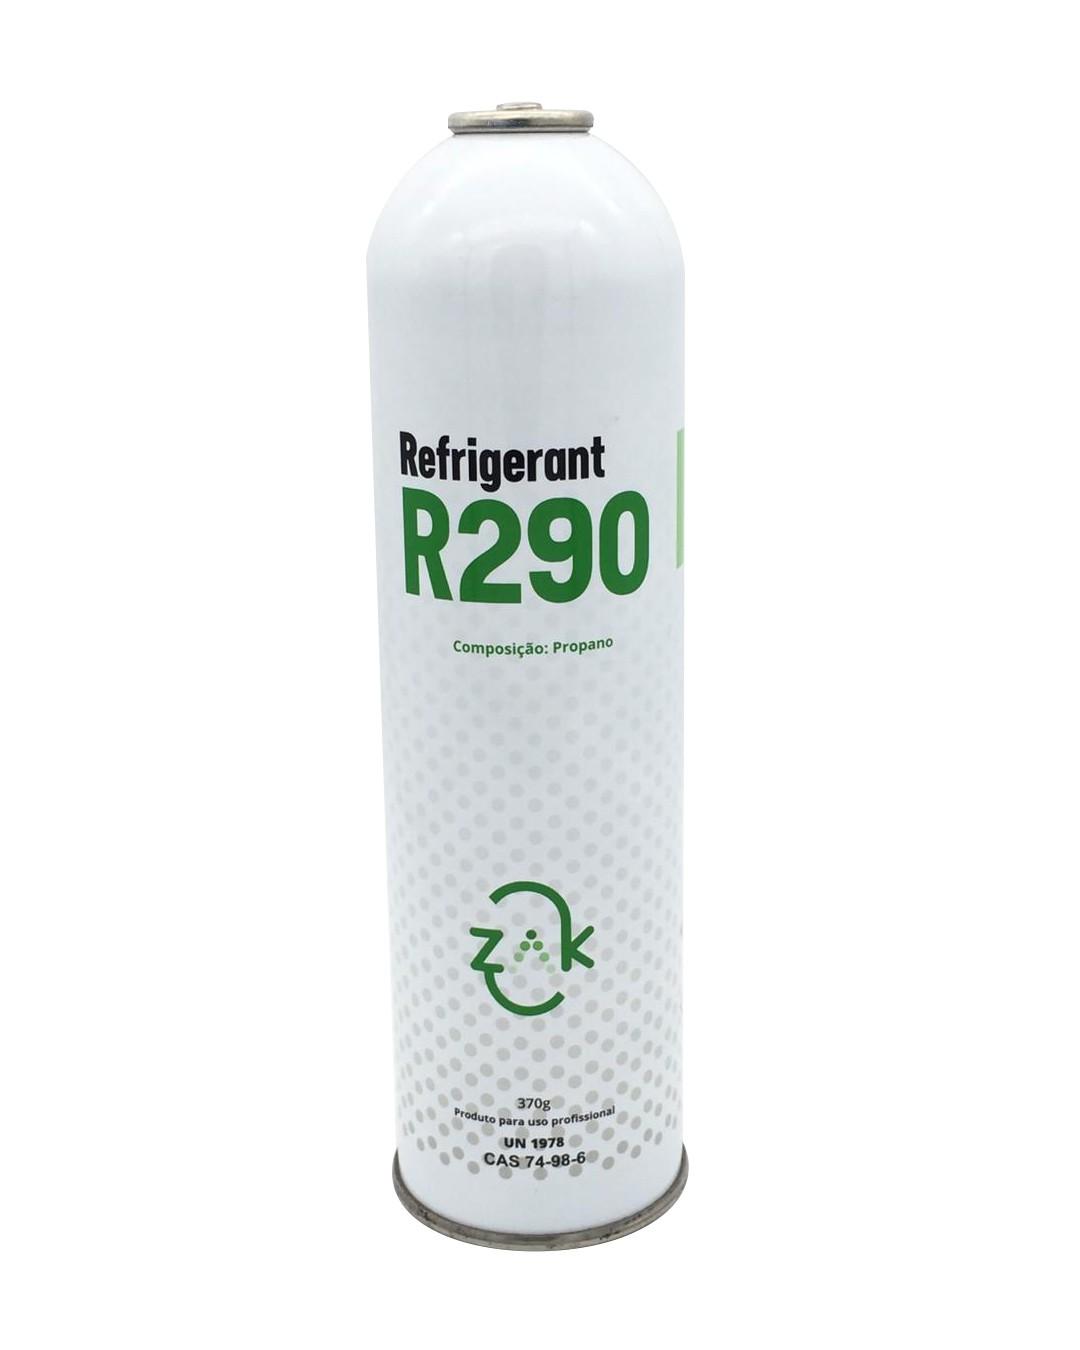 Gás Descartável Refrigerante R2900 Zak Cilindro de 370g